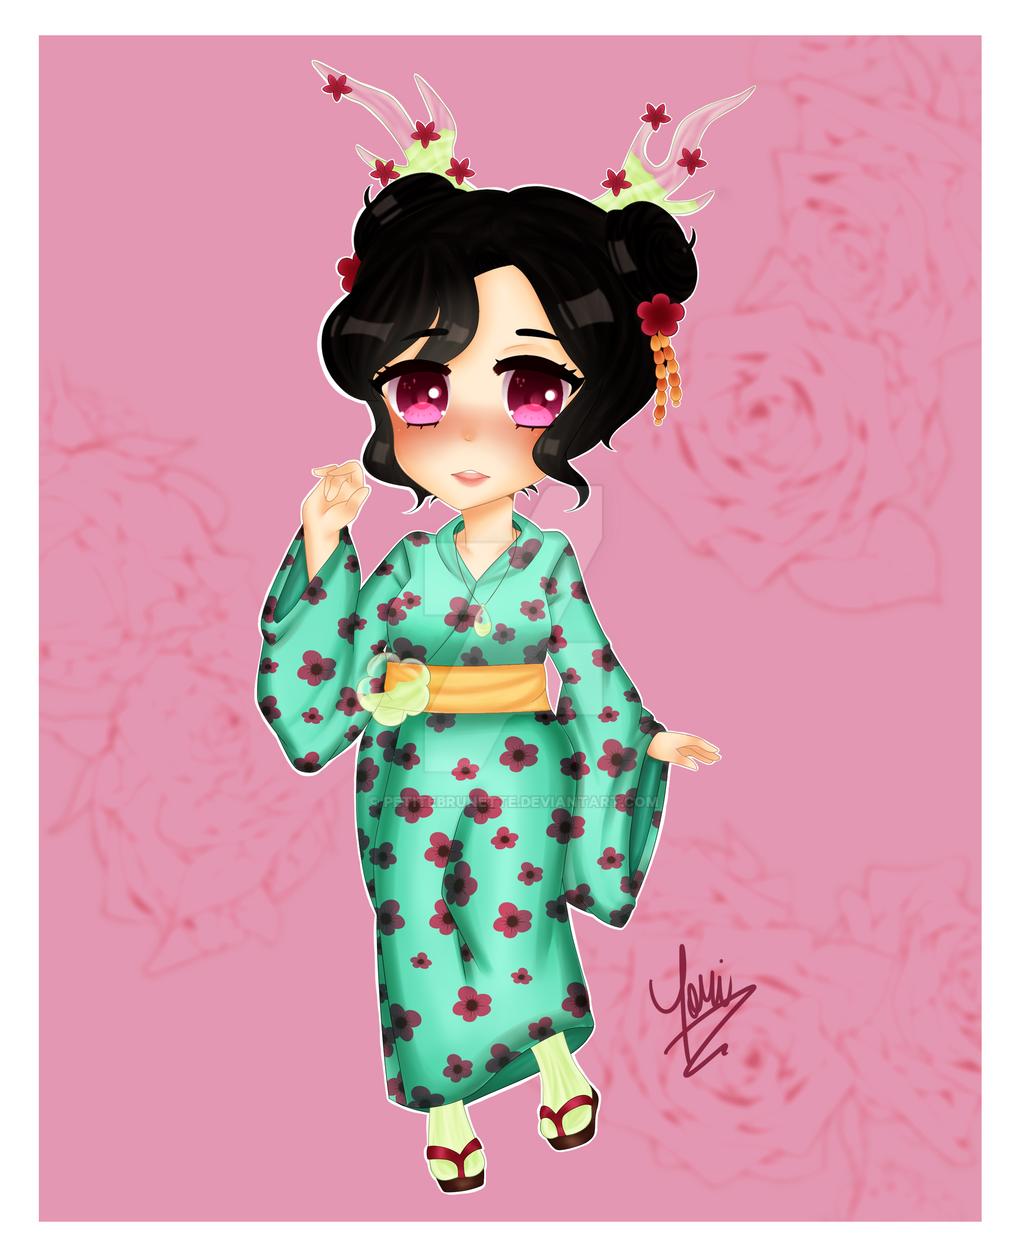 (OC Art) Arina~ by PetiteBrunette